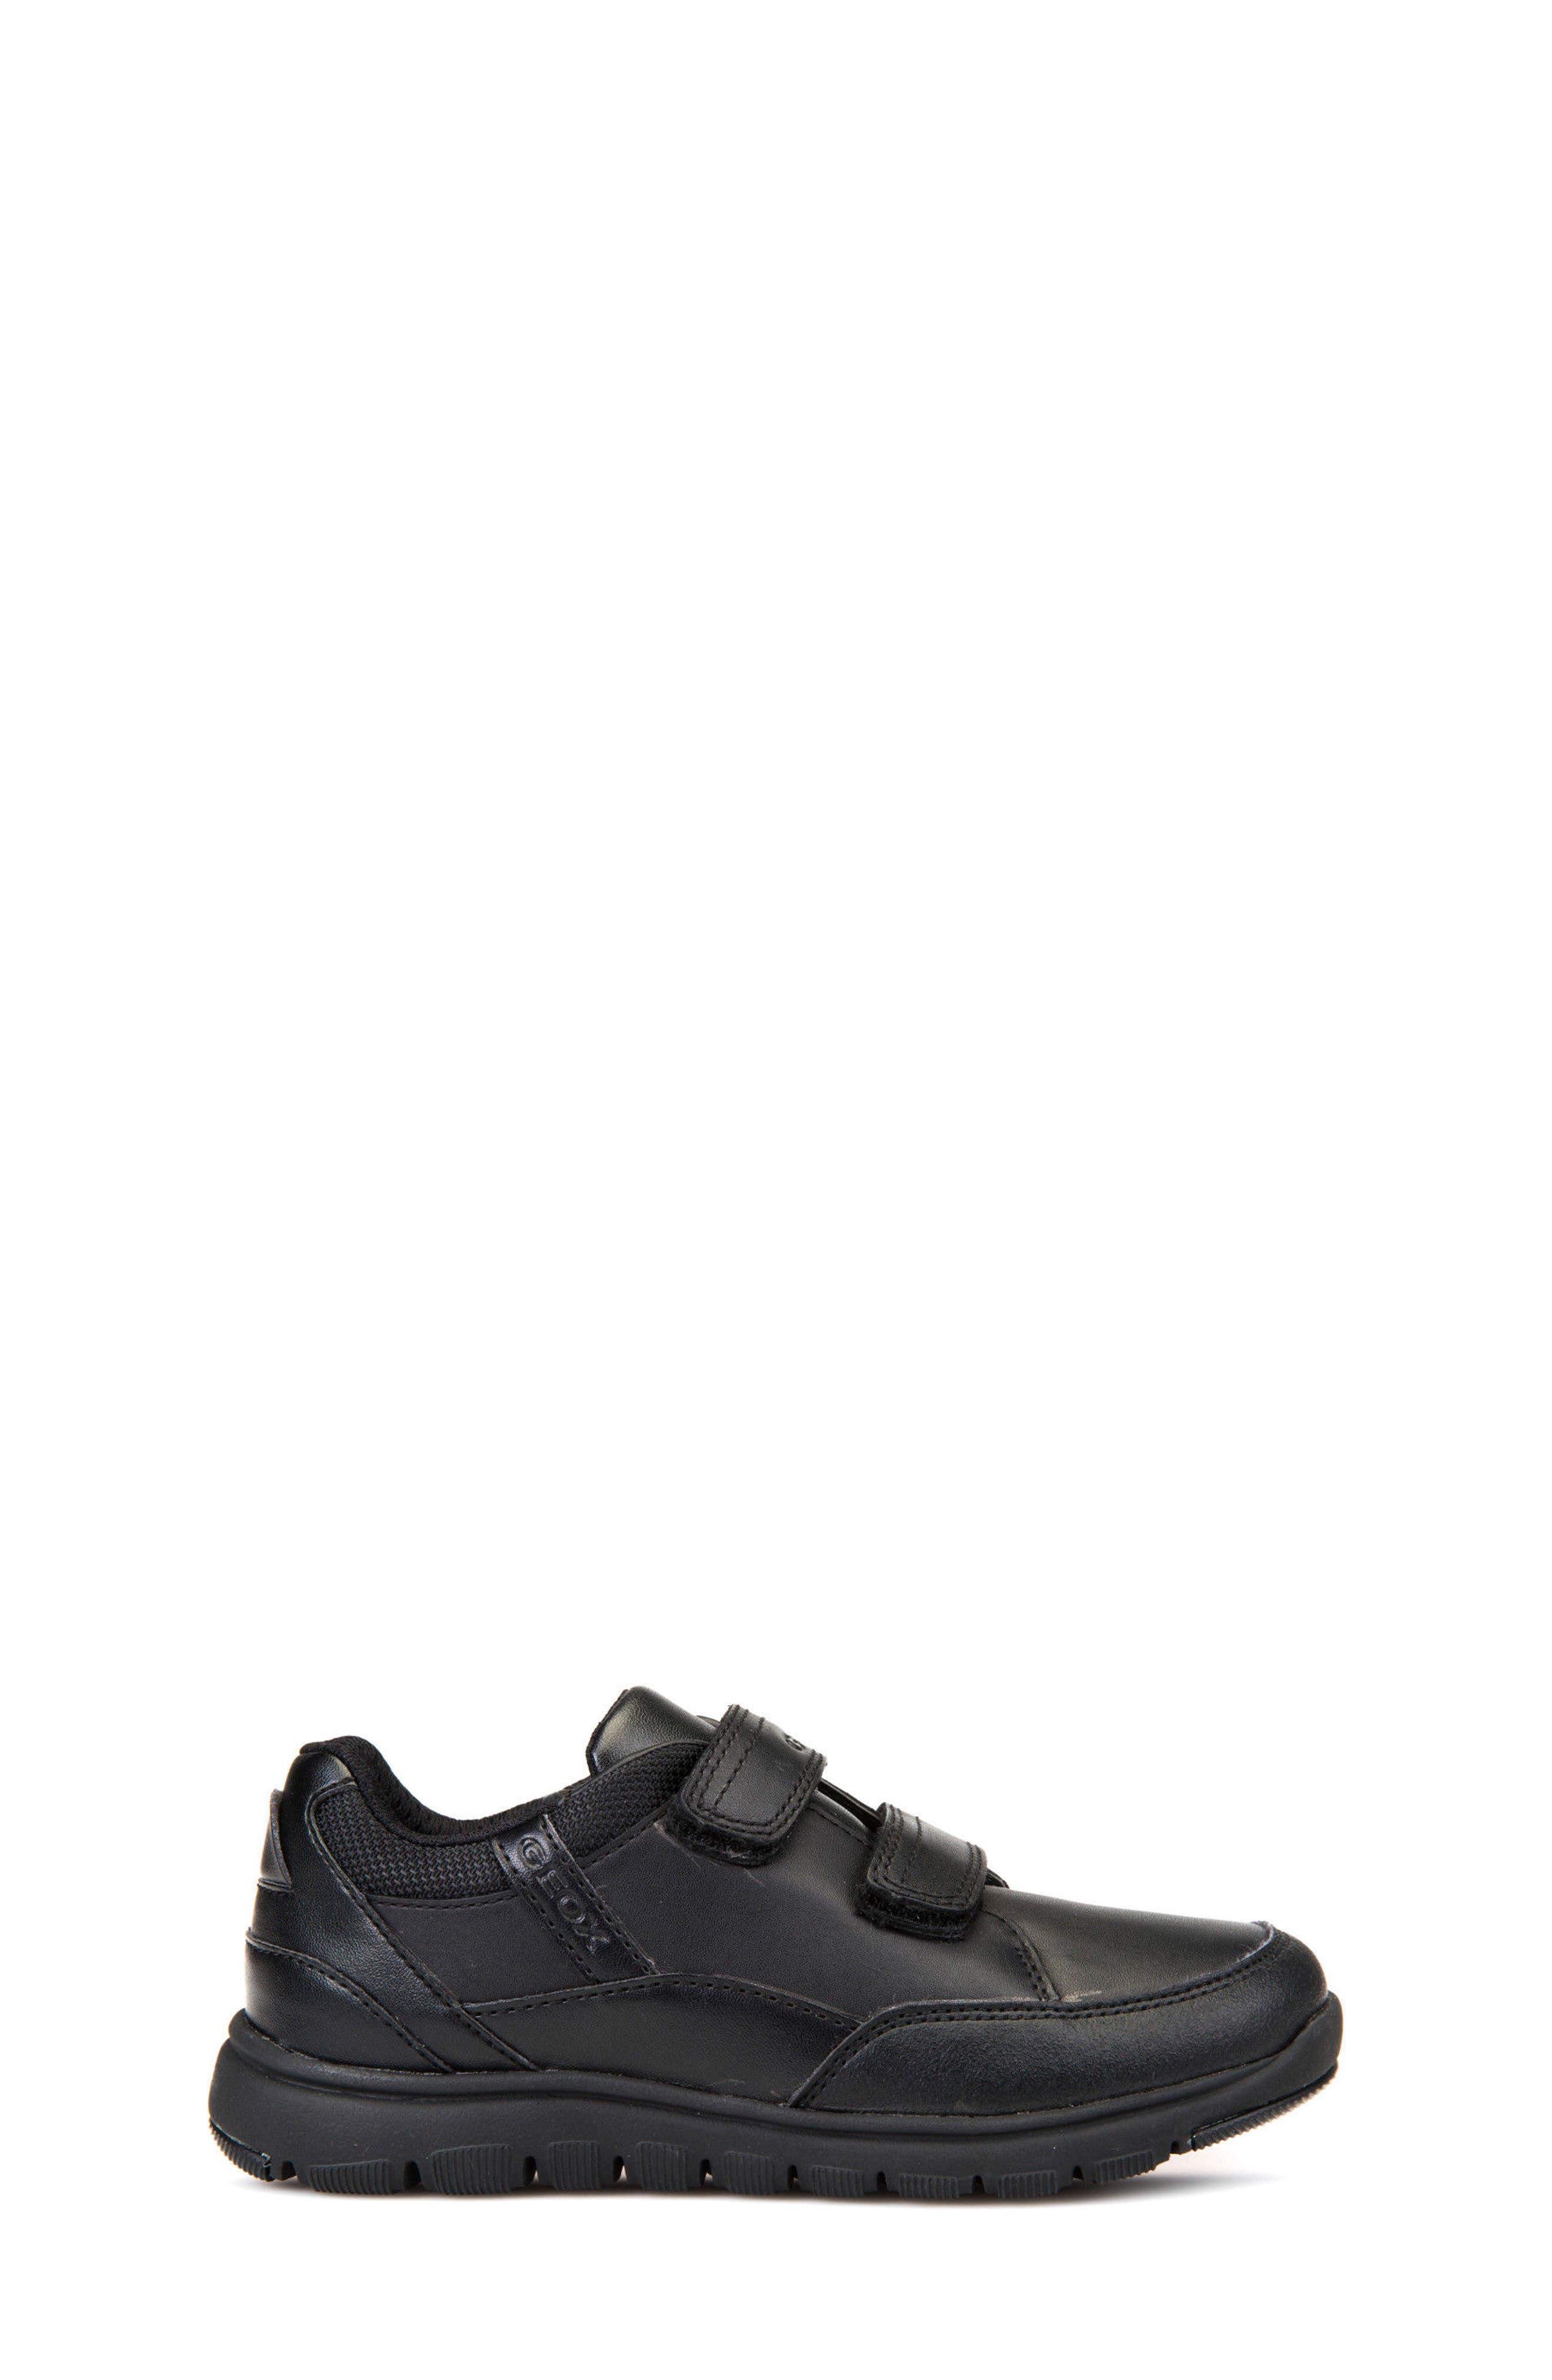 Xunday Low Top Sneaker,                             Alternate thumbnail 3, color,                             BLACK